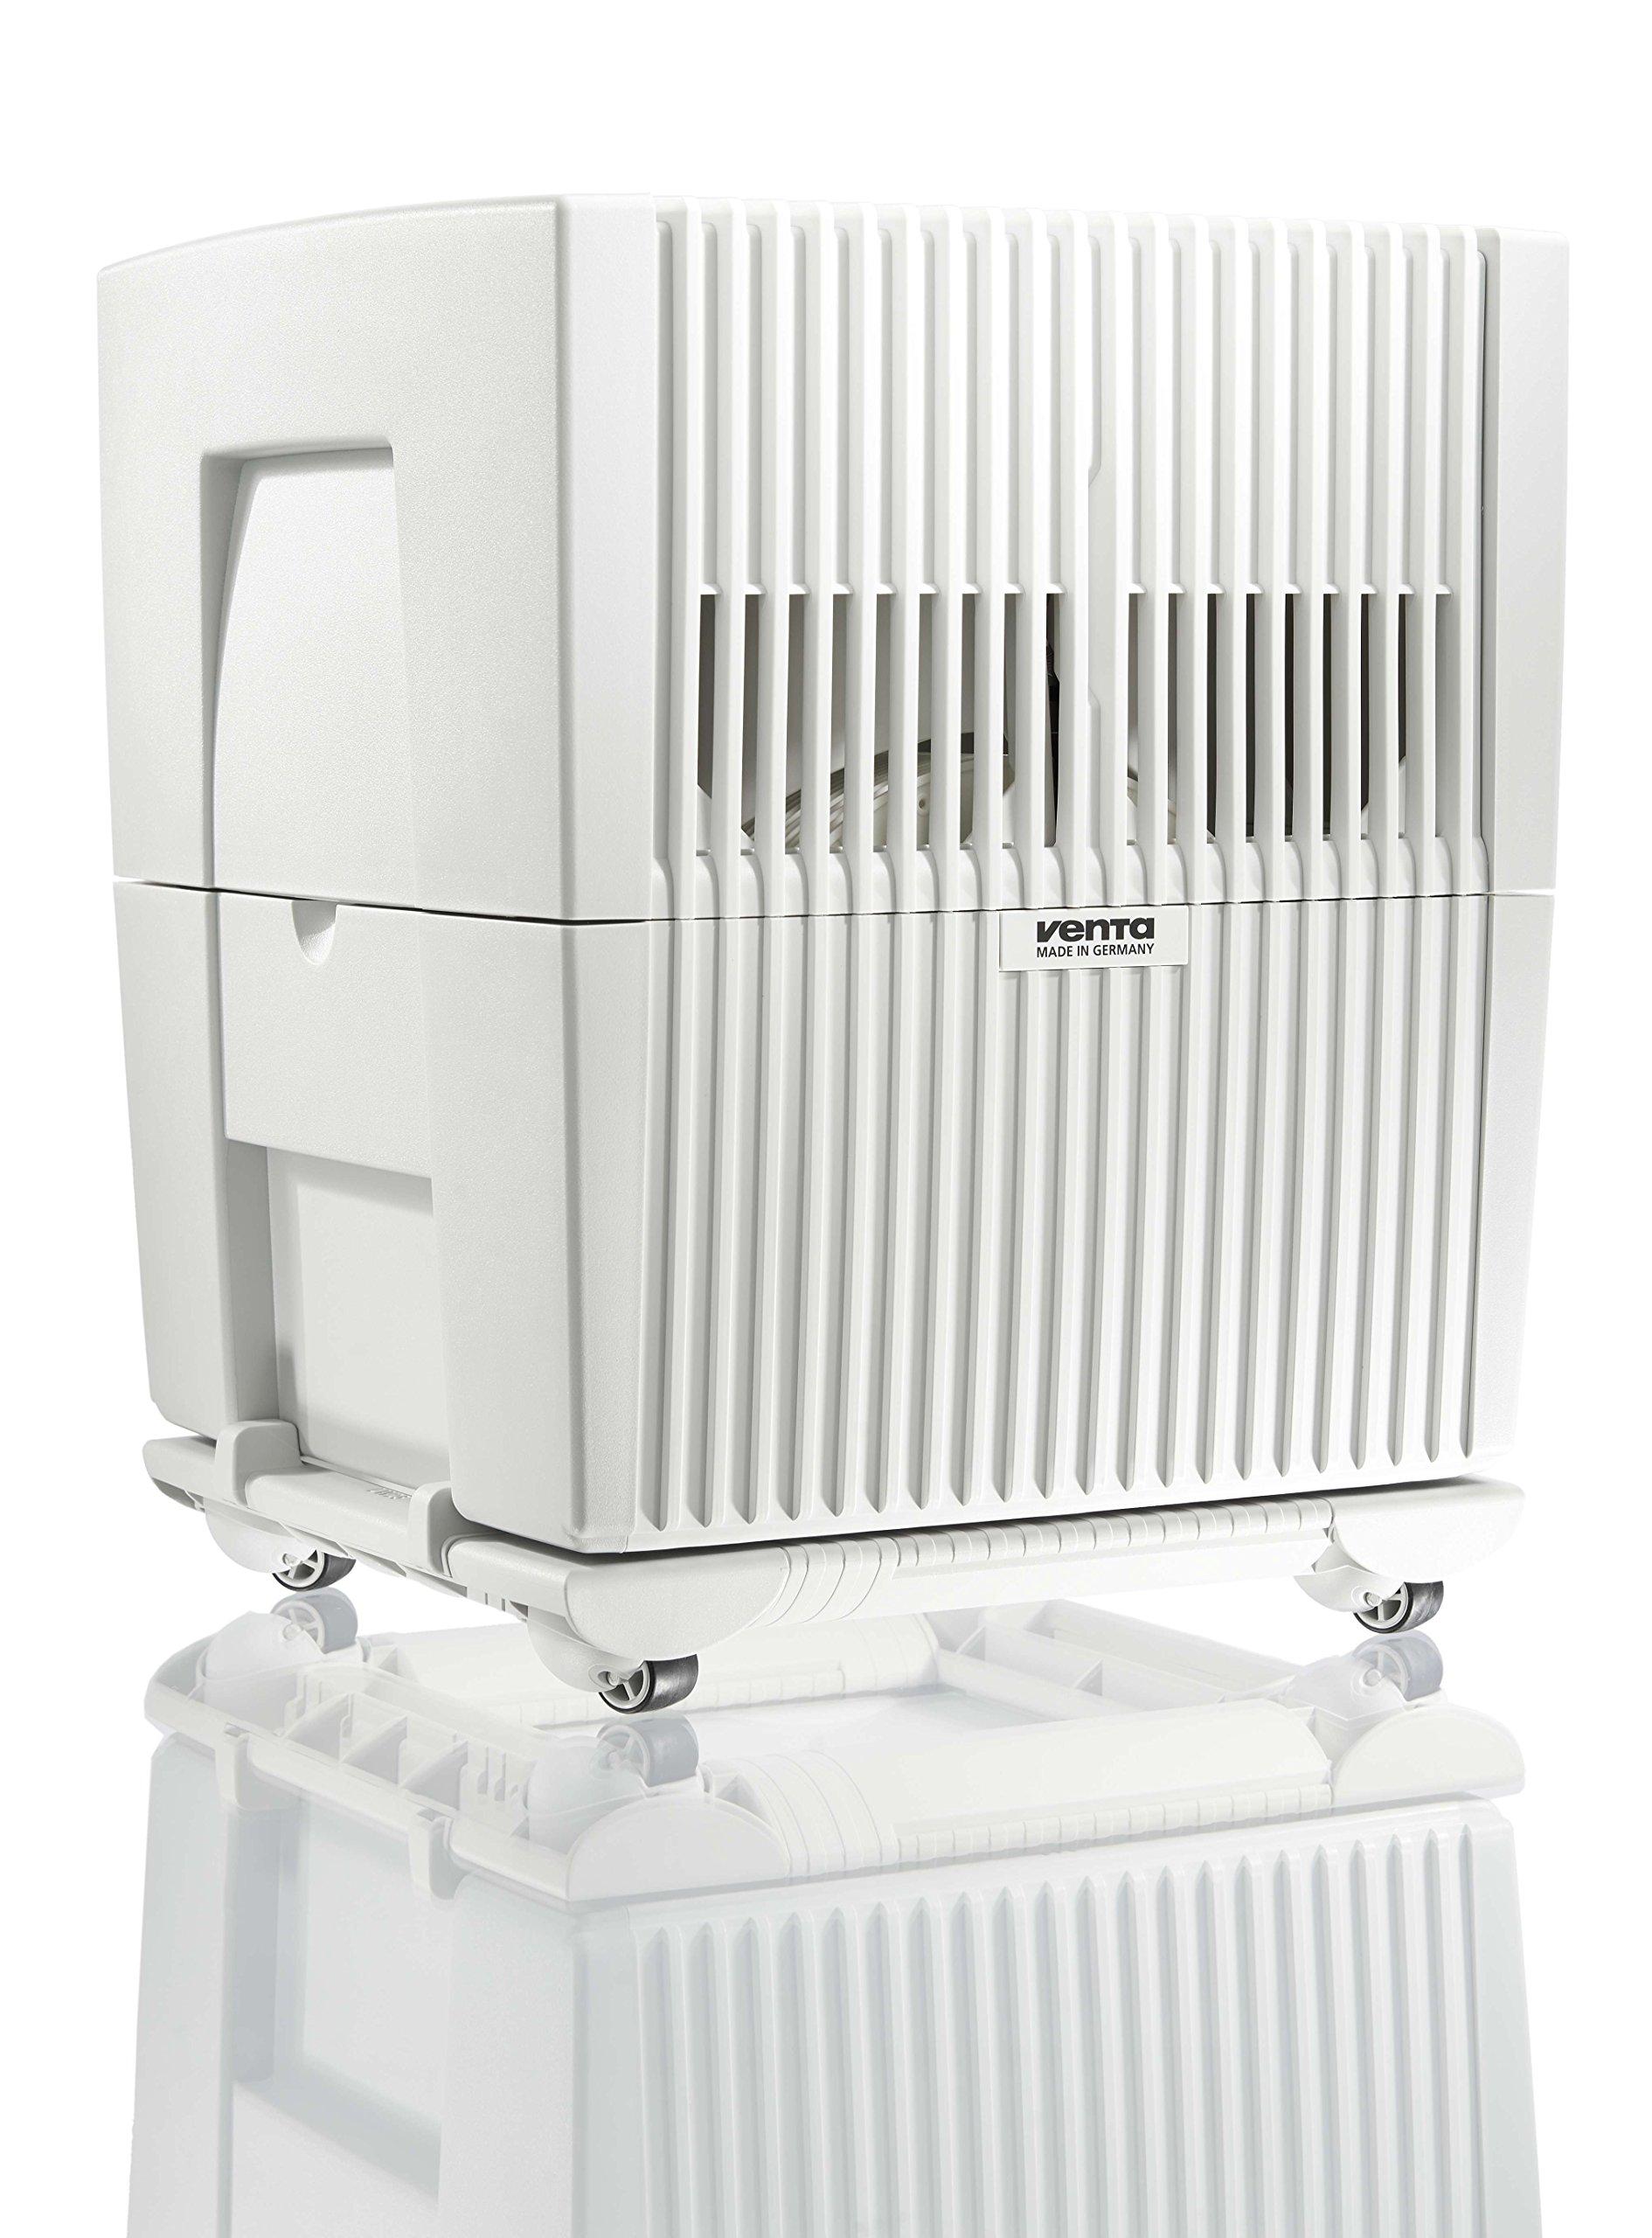 Venta LW45 air purifiers: Amazon.co.uk: Electronics